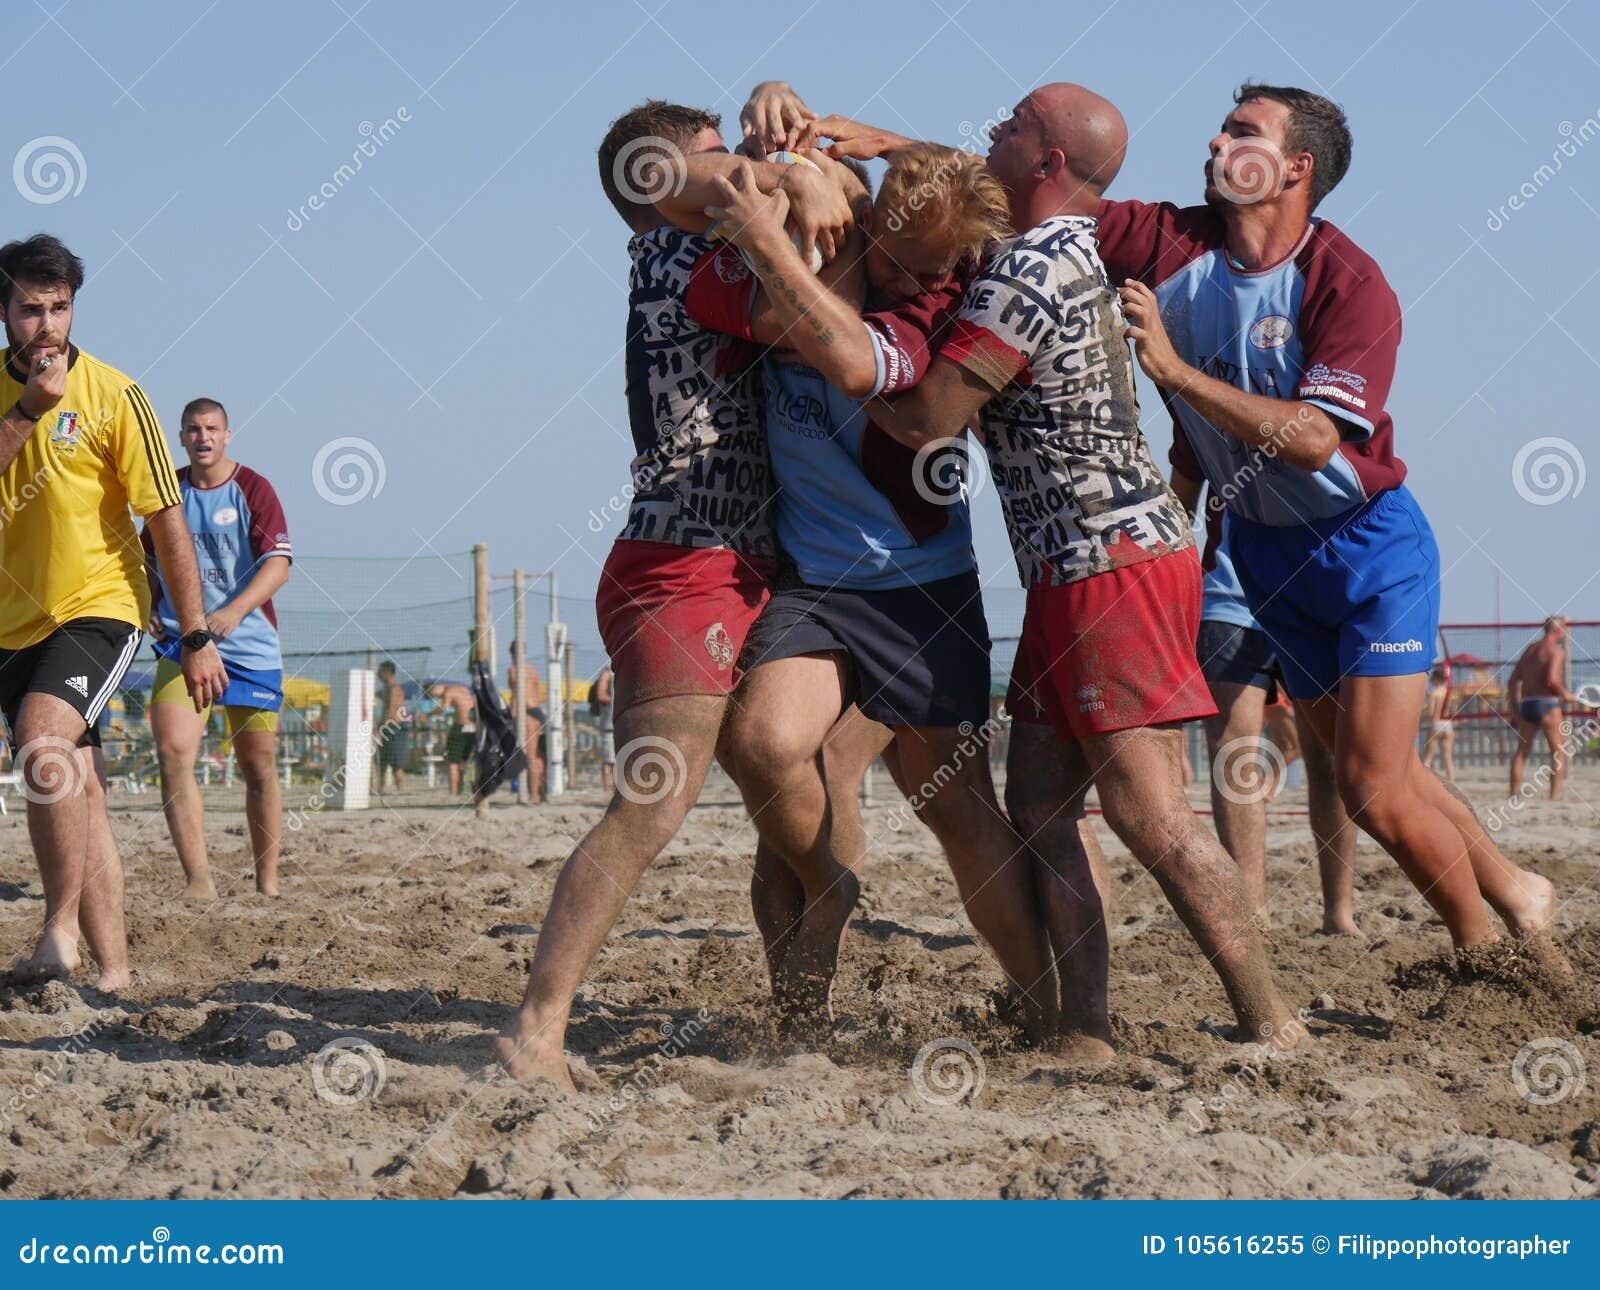 Beach rugby rosolina fi vs rosolina editorial image